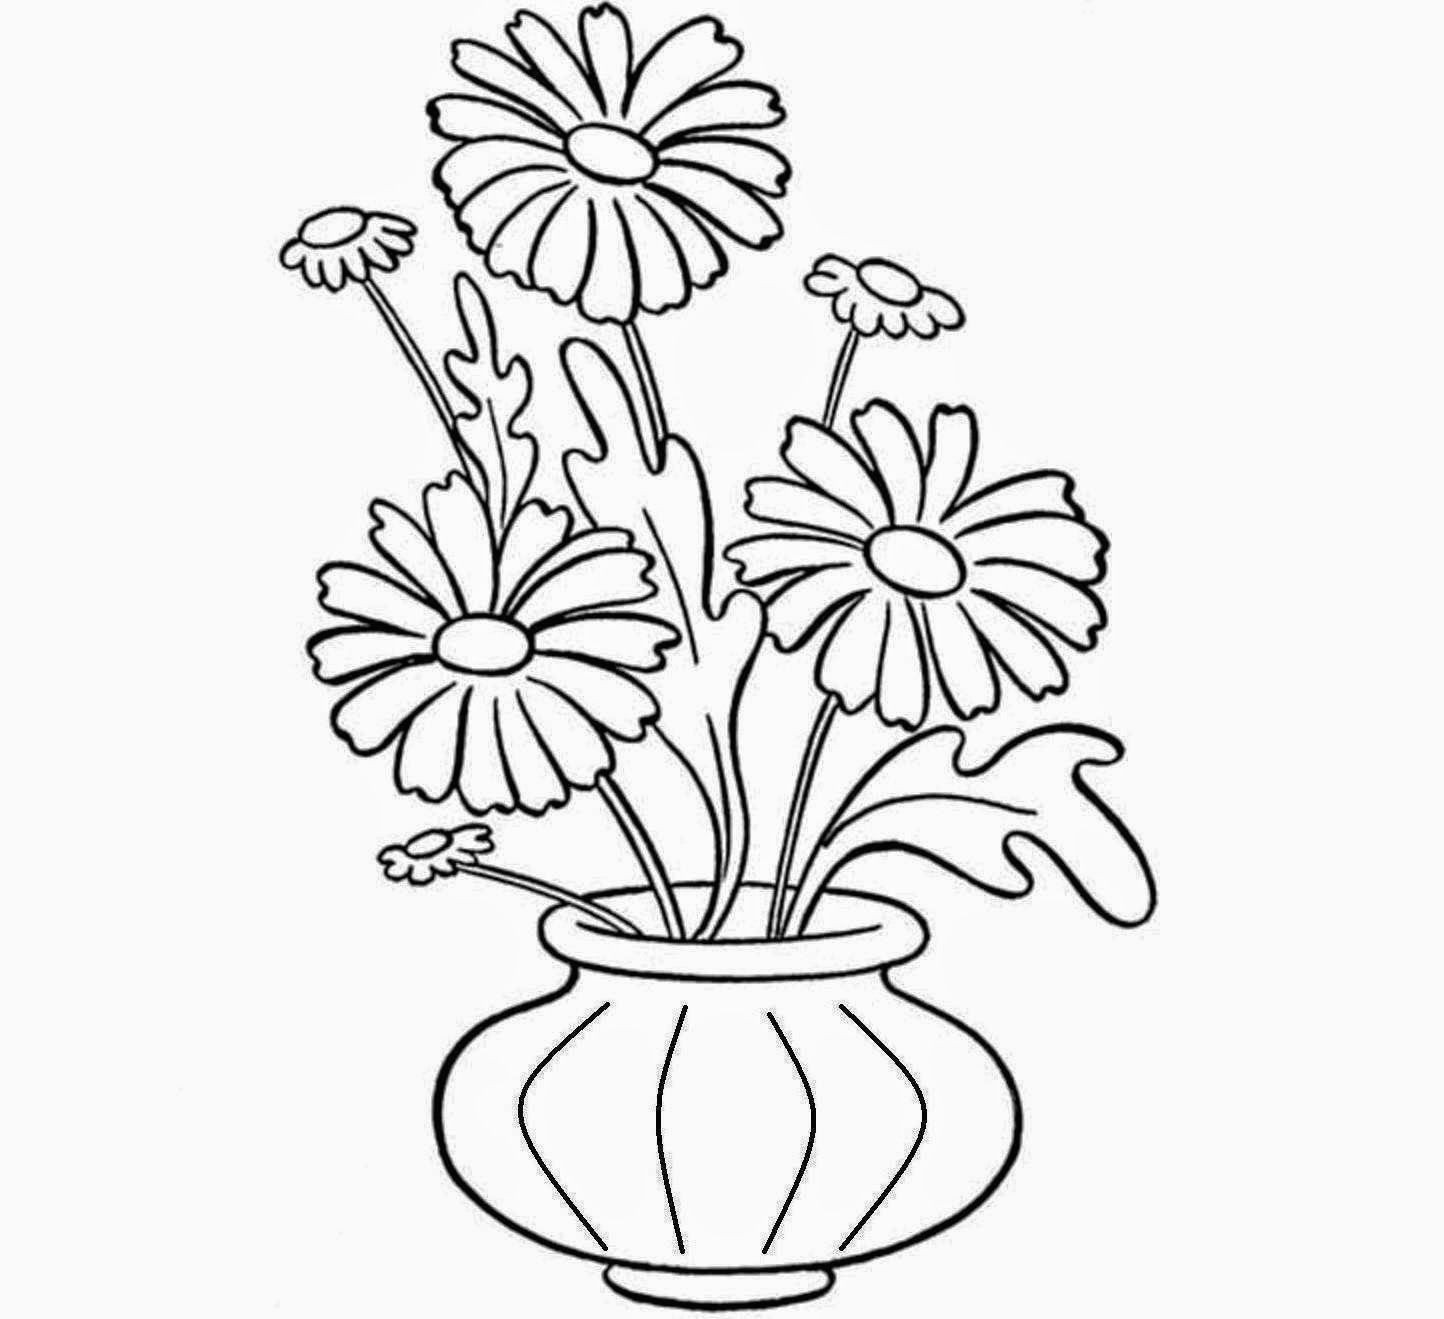 mind blowing tips vases vintage glass vases garden center pieces vases painting easy large vases hallways square vases tea lights